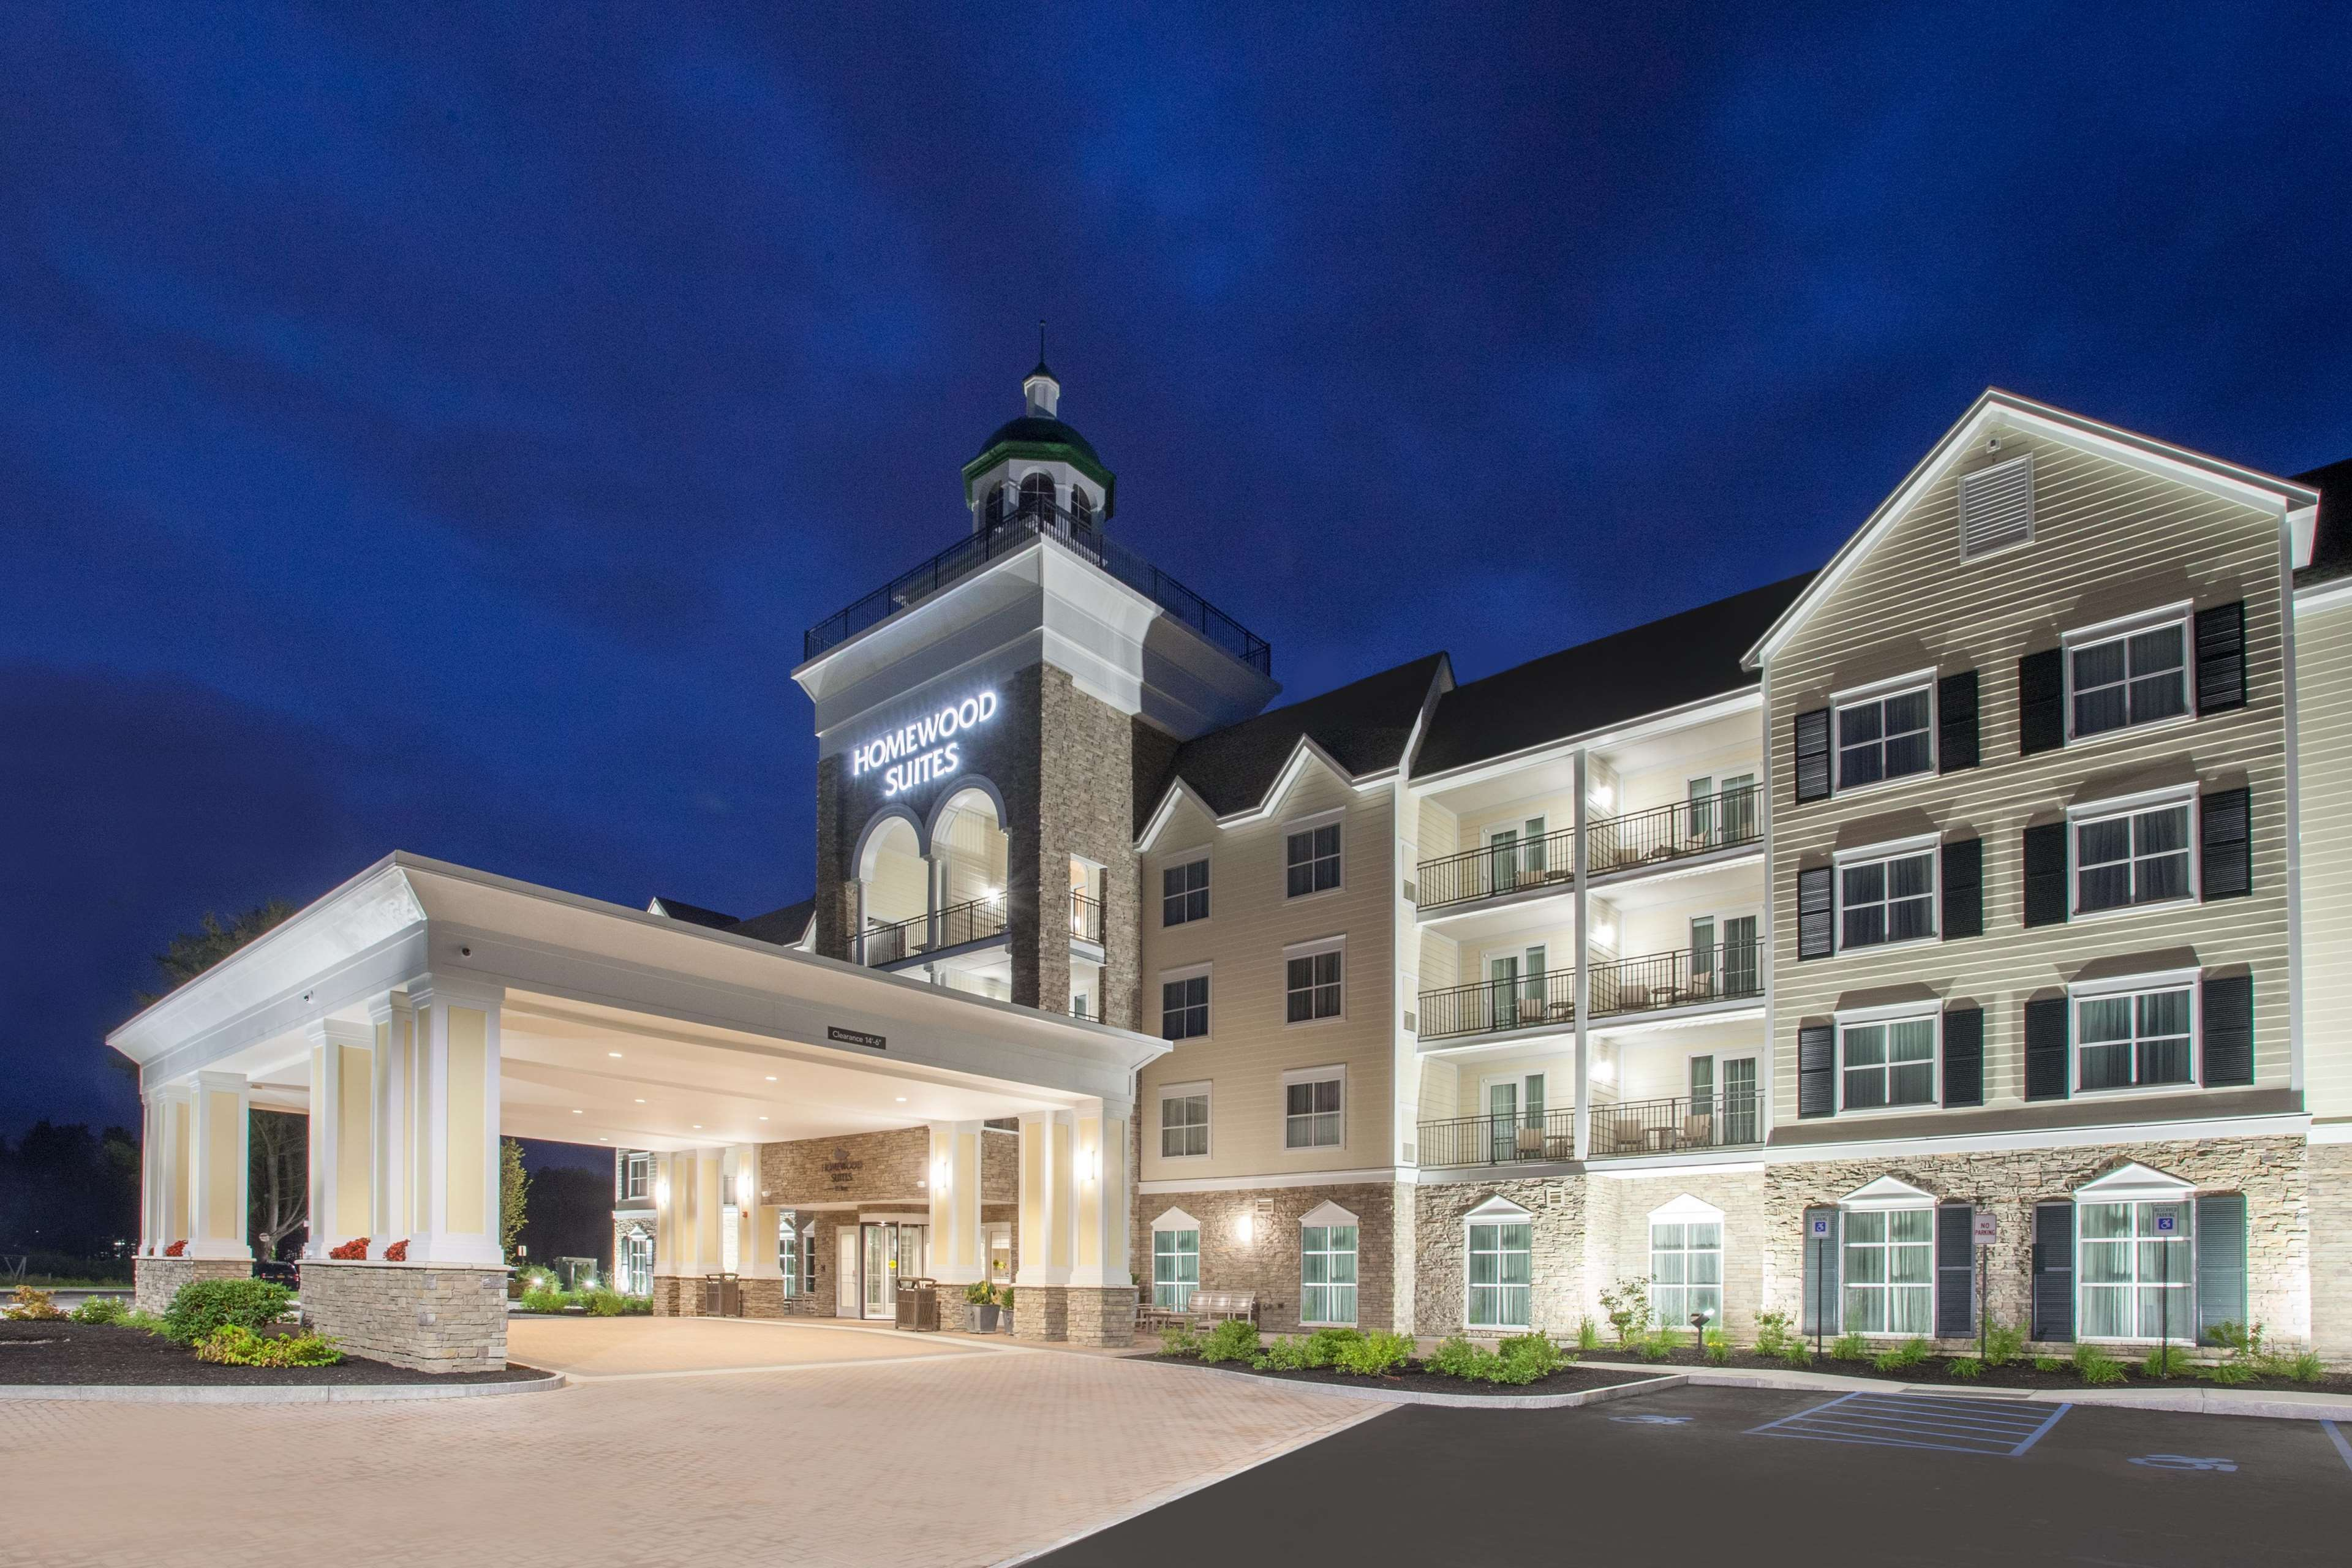 Homewood Suites by Hilton Saratoga Springs image 35